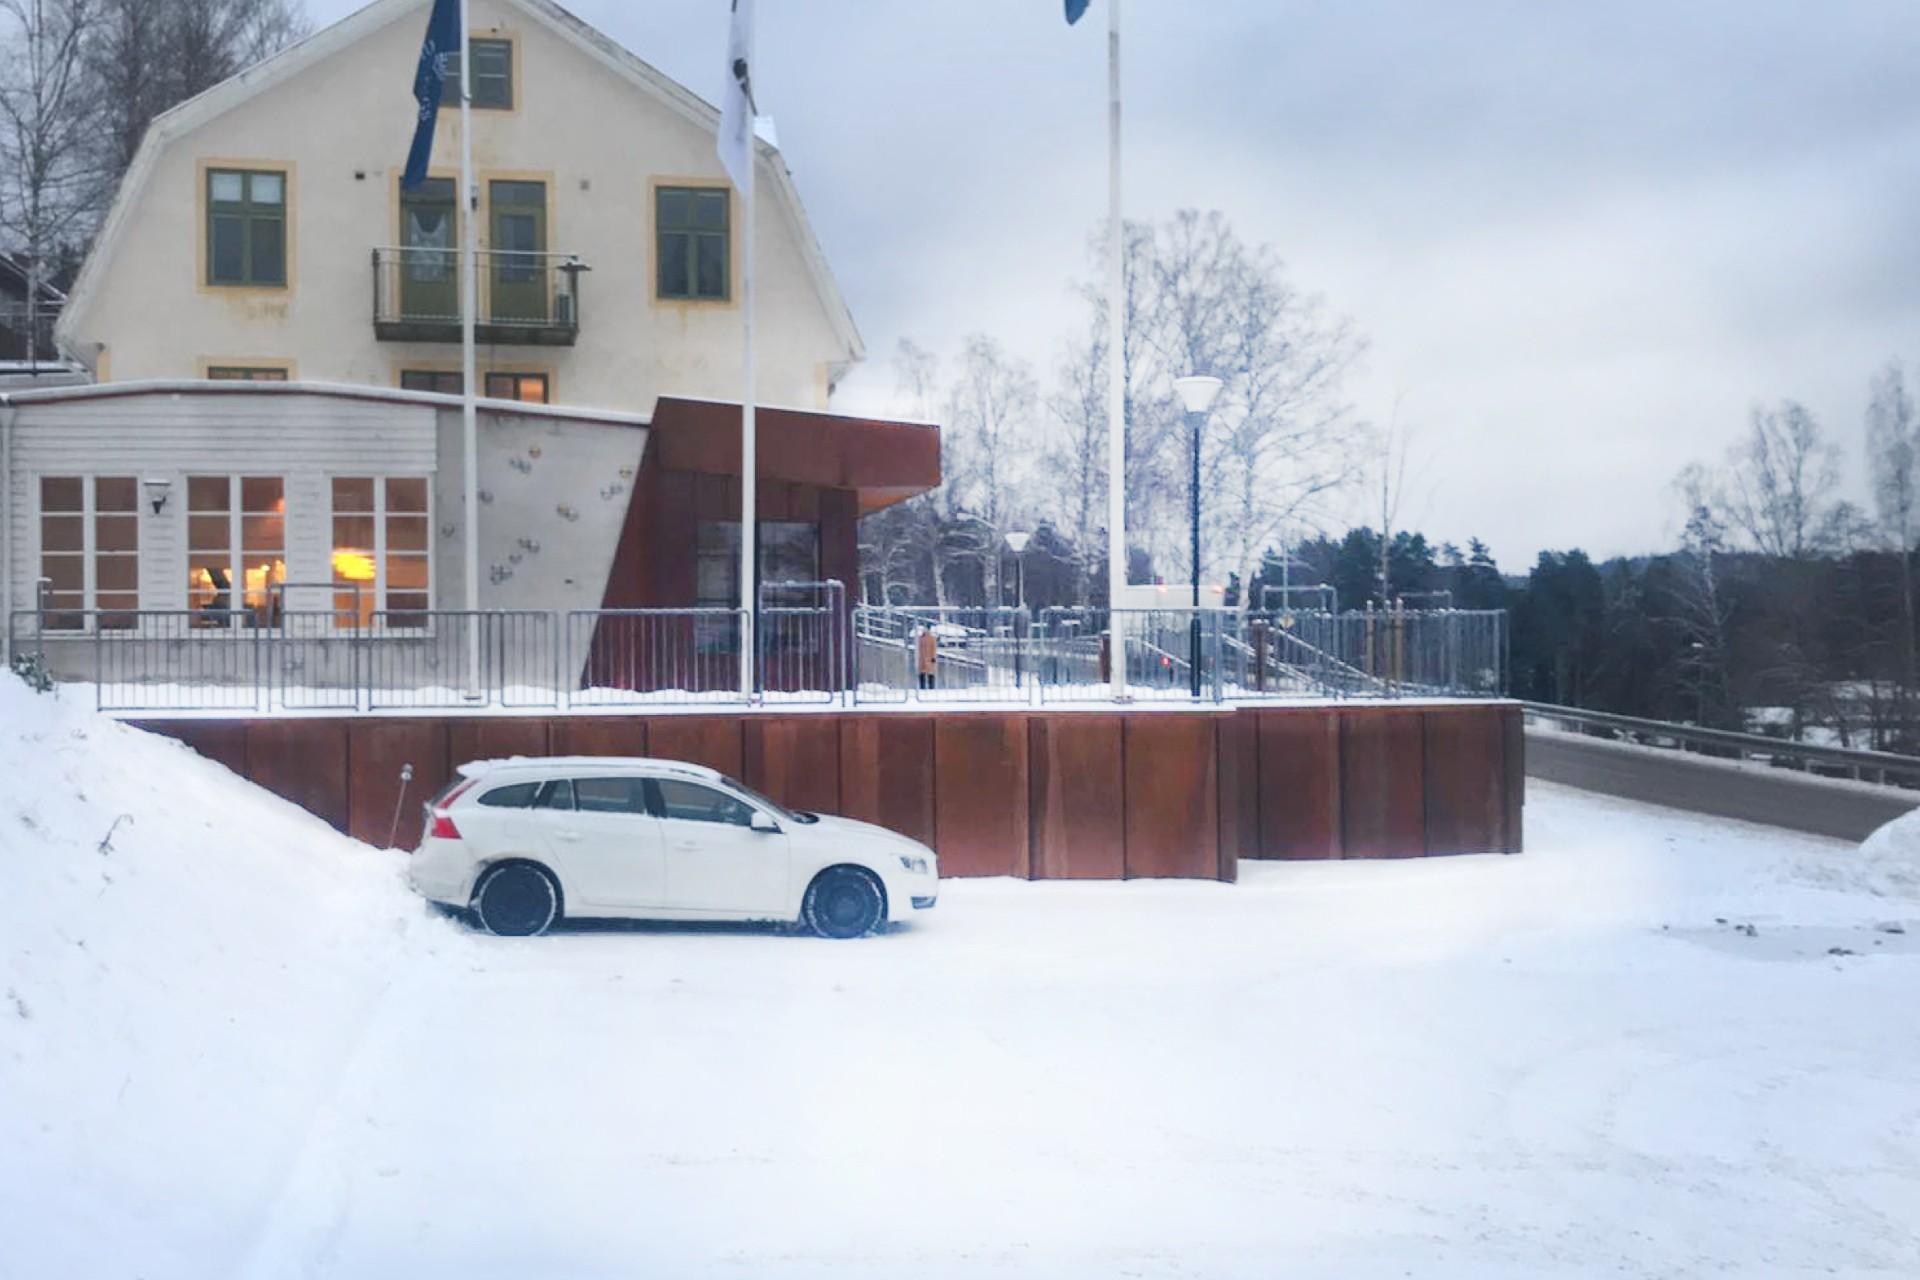 esteneby-dals-folkbibliotek15